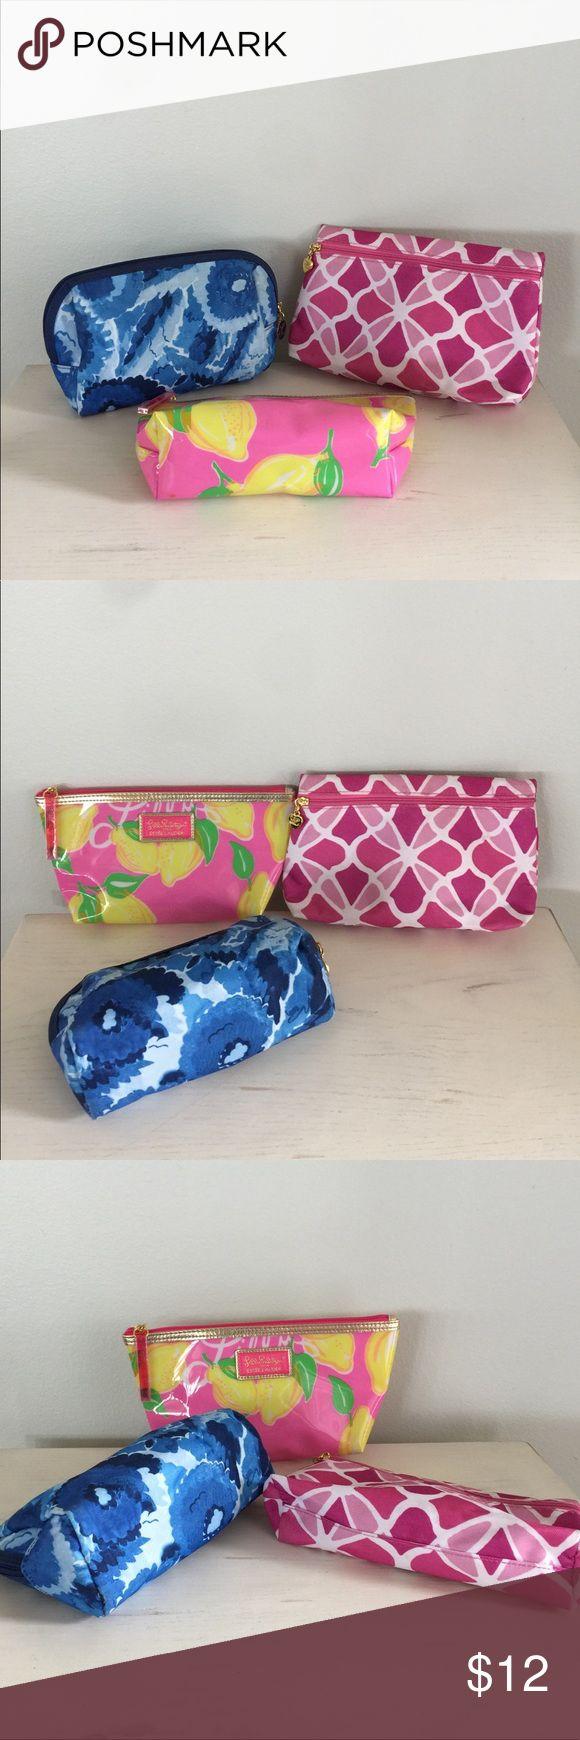 Estee Lauder lot of 3 cosmetic make up bags Bundle of